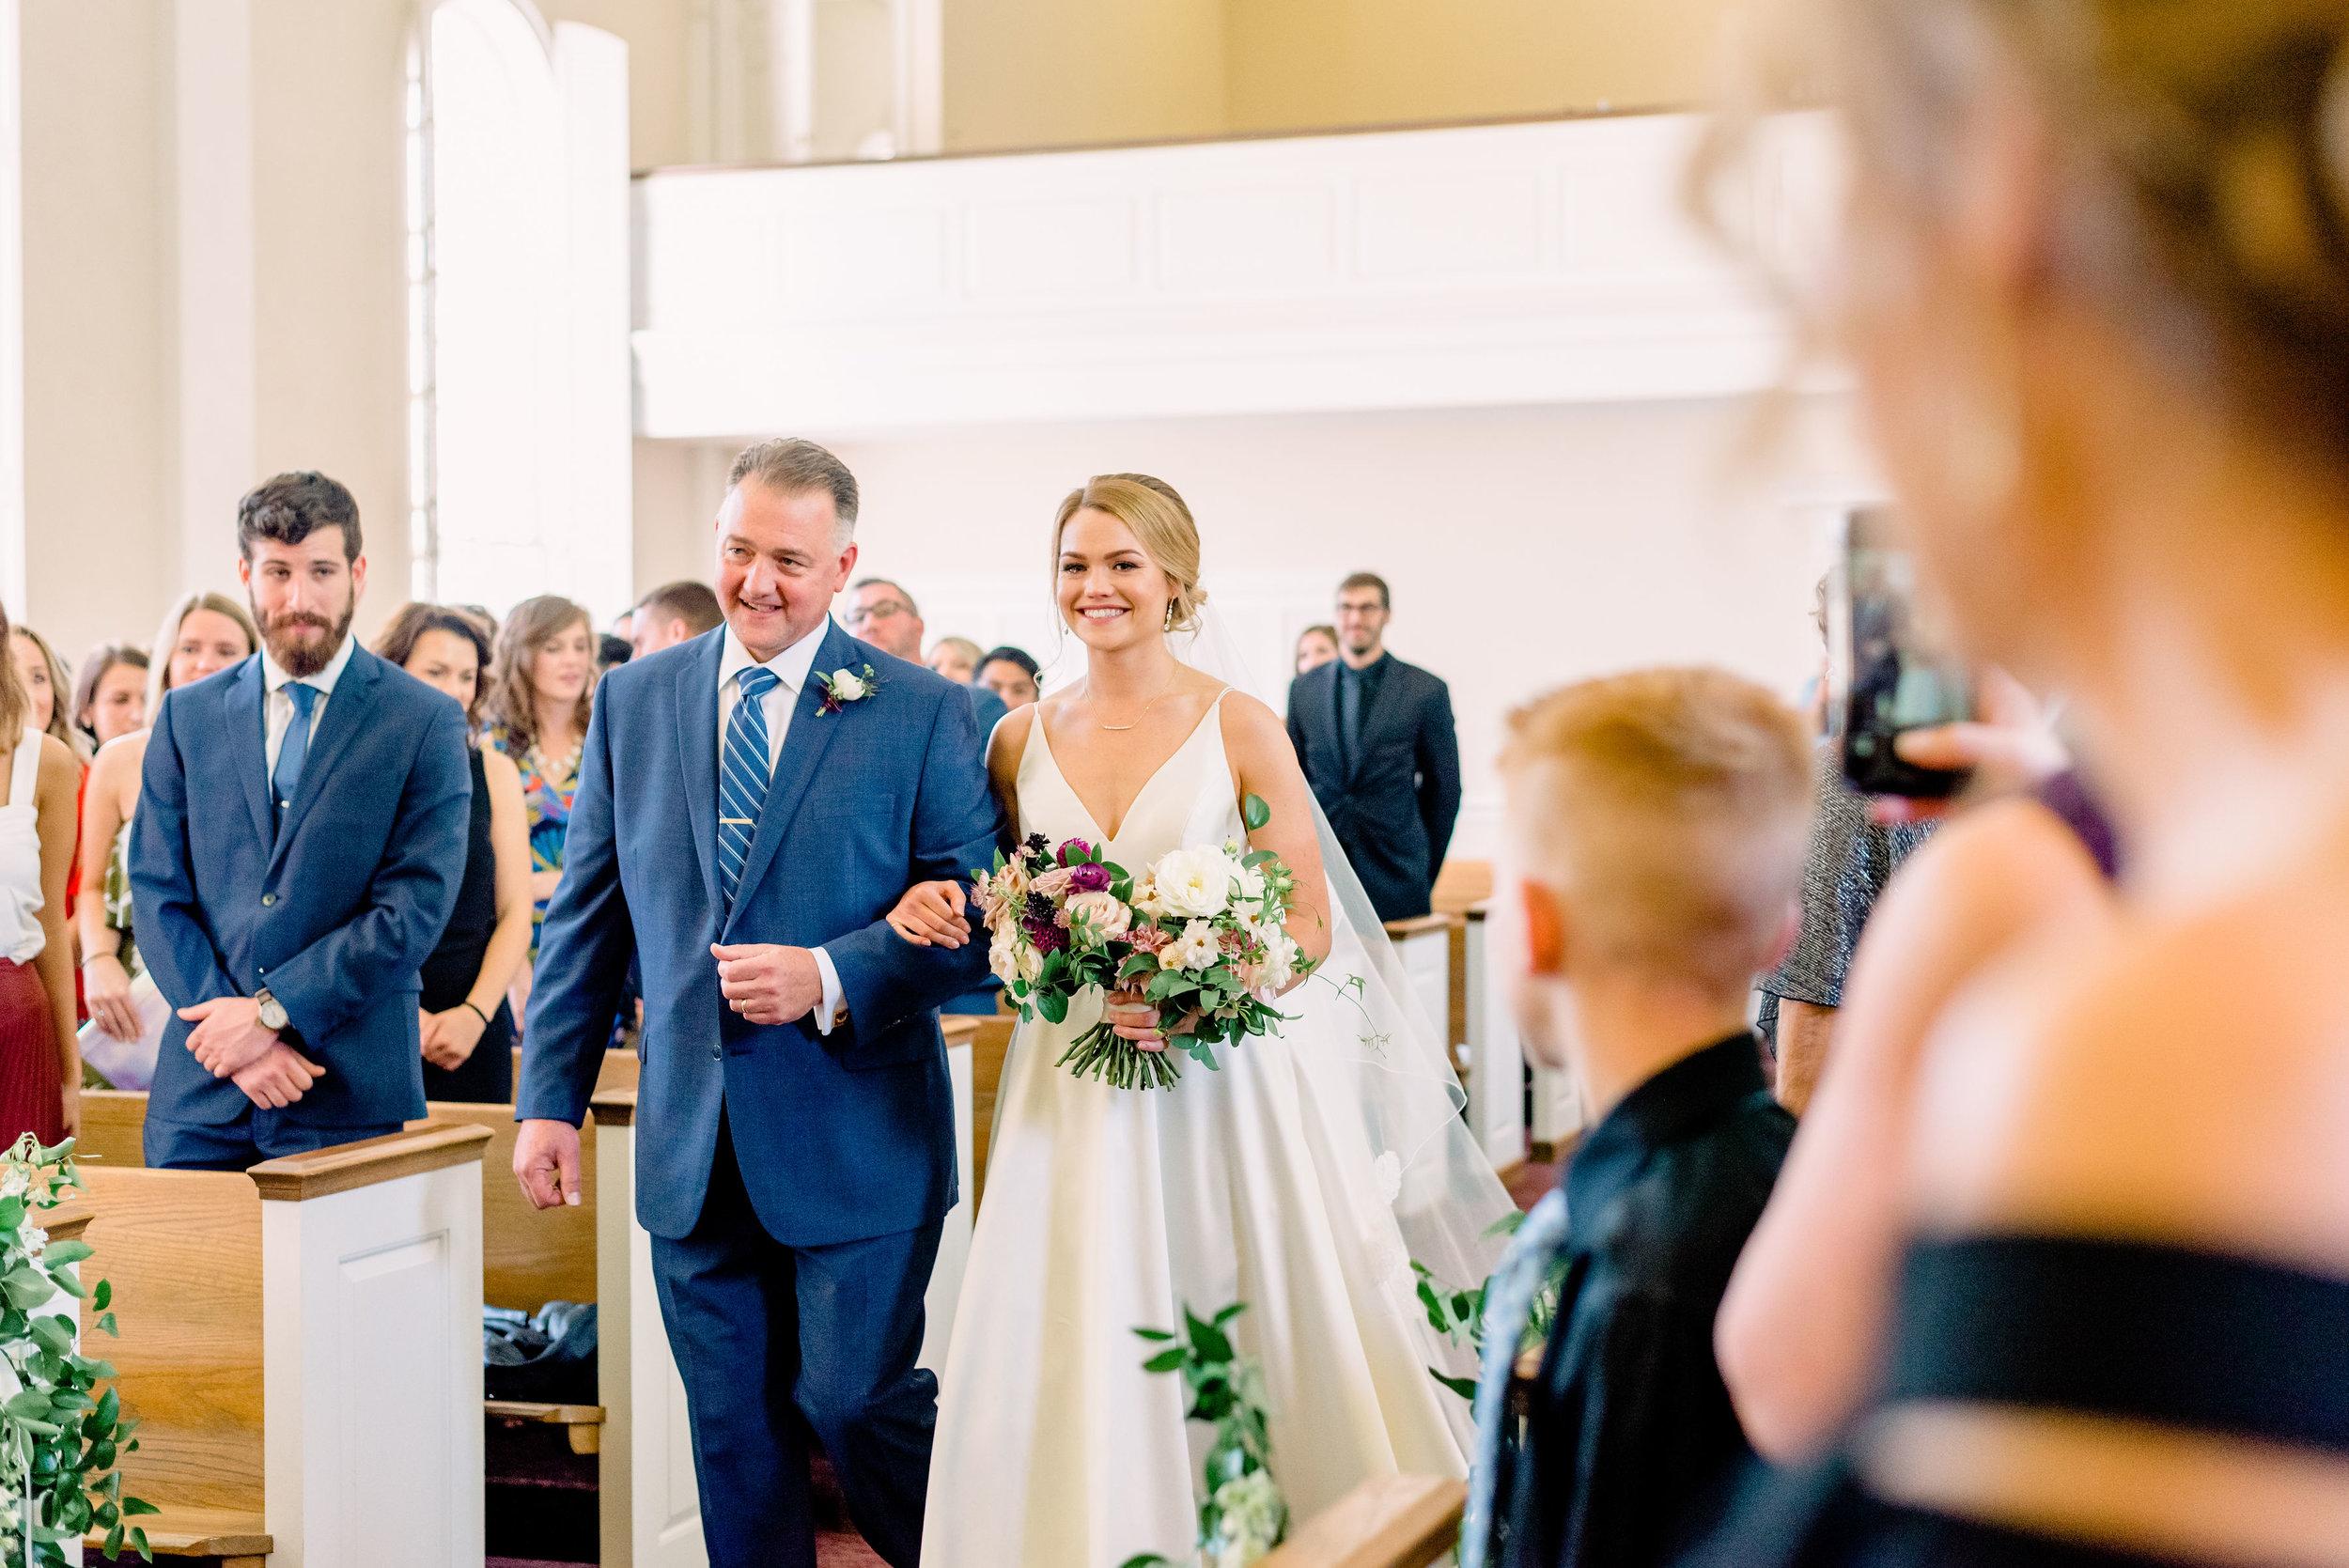 Hazelton_Wedding-245.jpg